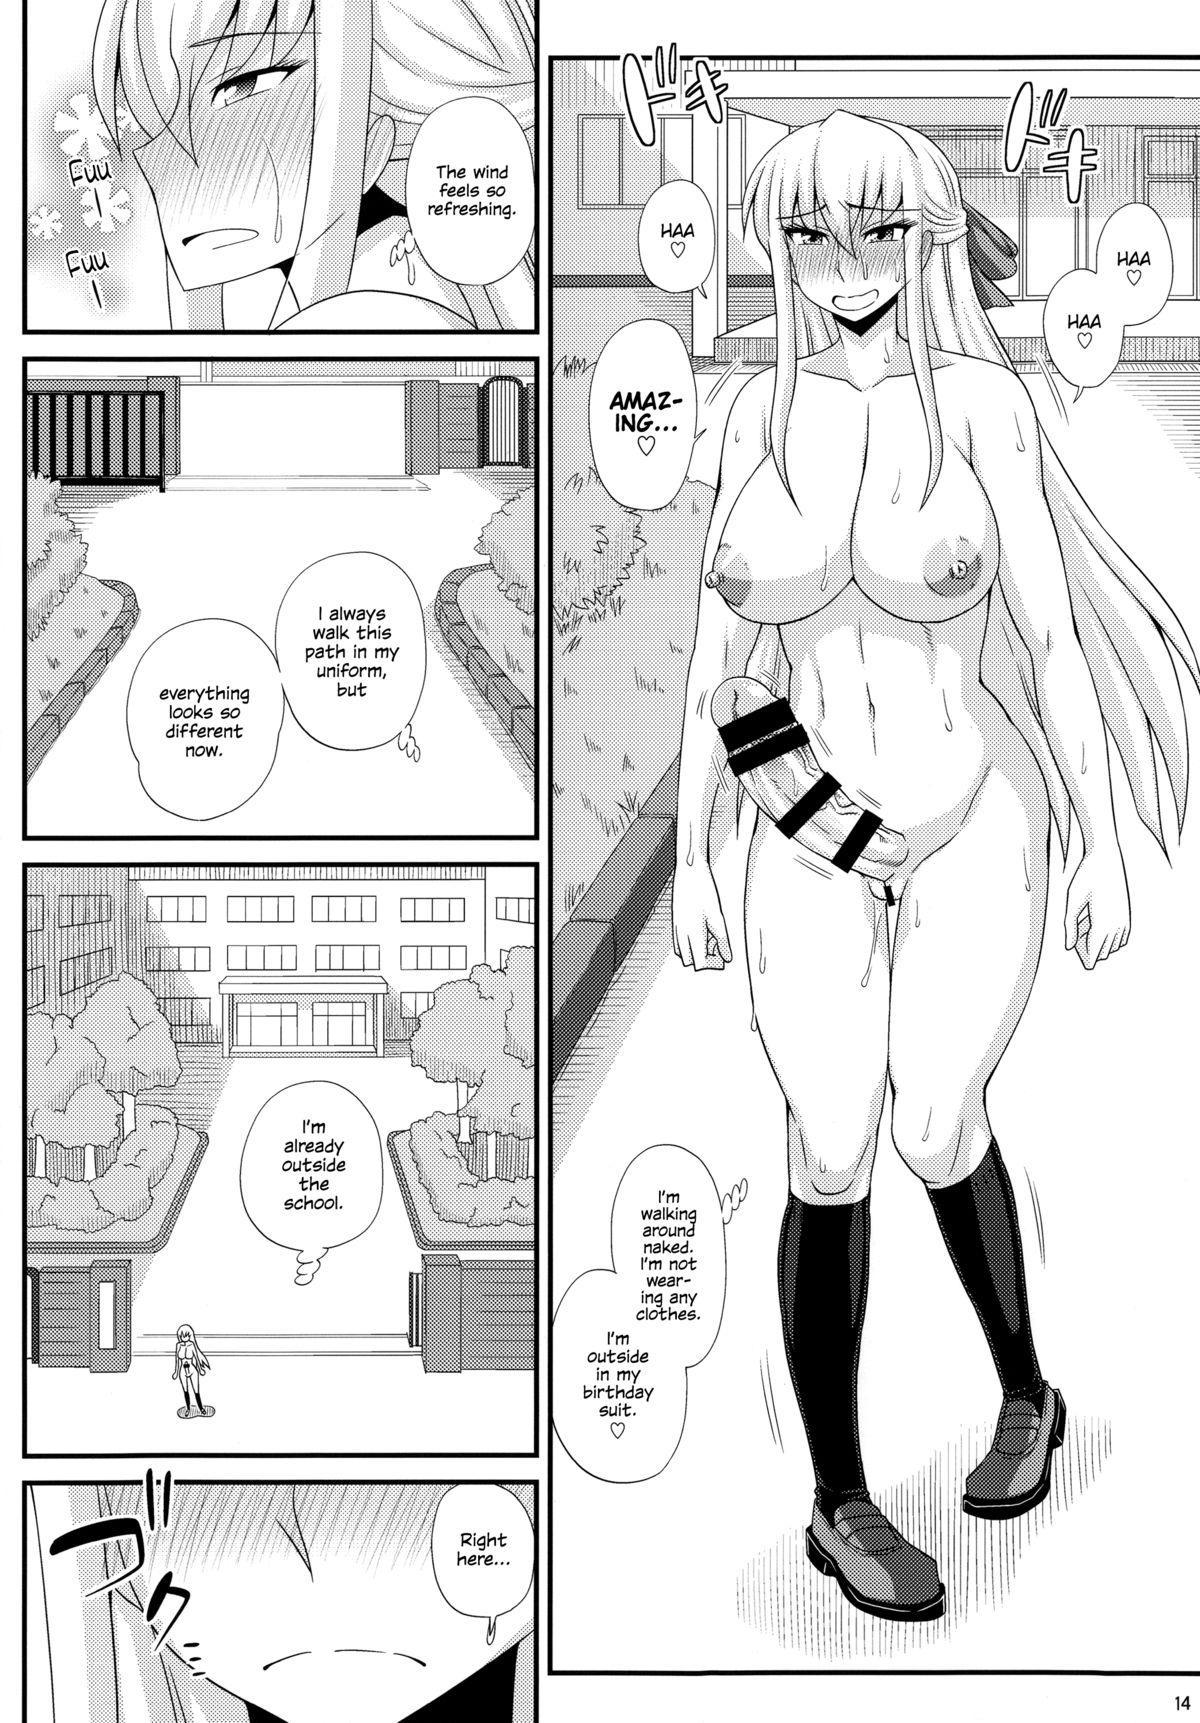 [Futanarun (Kurenai Yuuji)] Futanari Roshutsu Mania [Tankoubon Hatsubai Kinen Gou] | [Full Volume Commemorative Edition] [English] =SW= 12